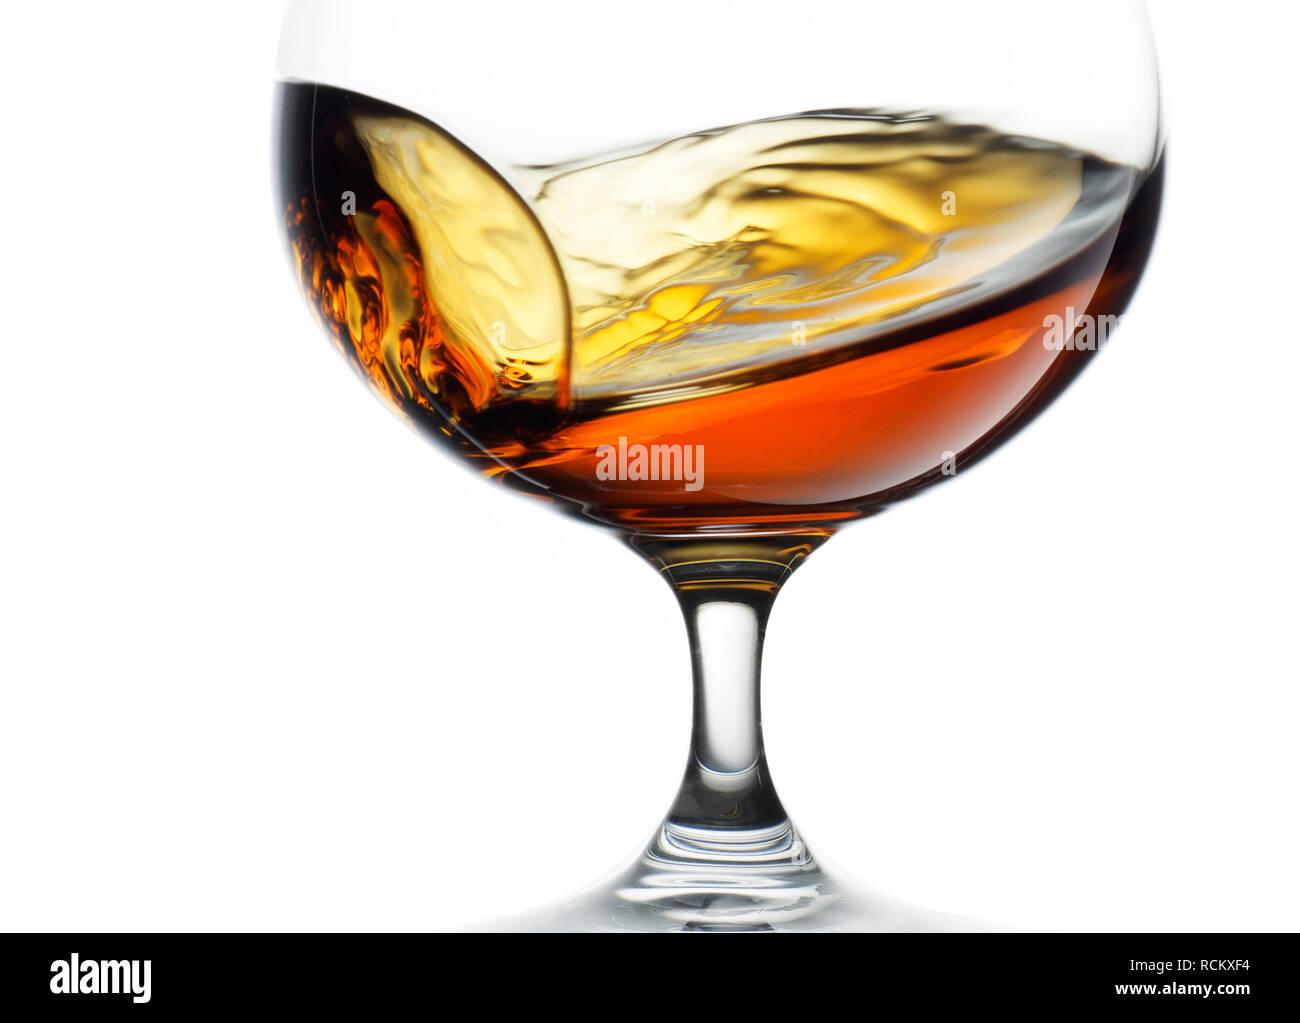 Glass of cognac brandy, back lit, plain background, cropped - Stock Image